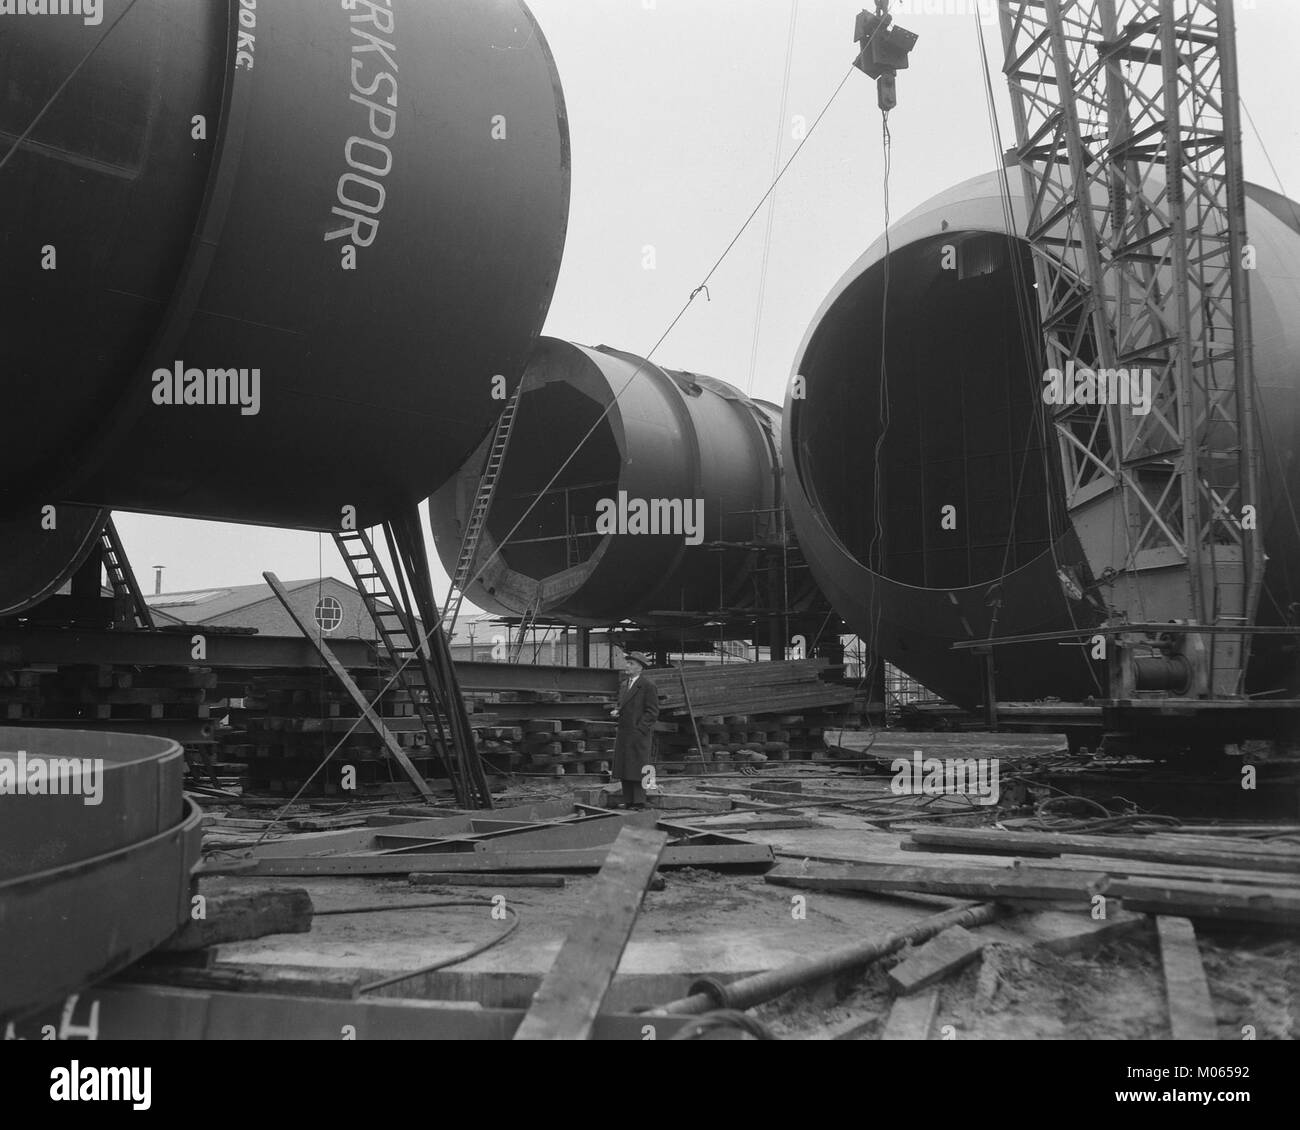 Bouw windtunnel Nationaal Luchtvaartlaboratorium Amsterdam, Bestanddeelnr 908-1556 - Stock Image